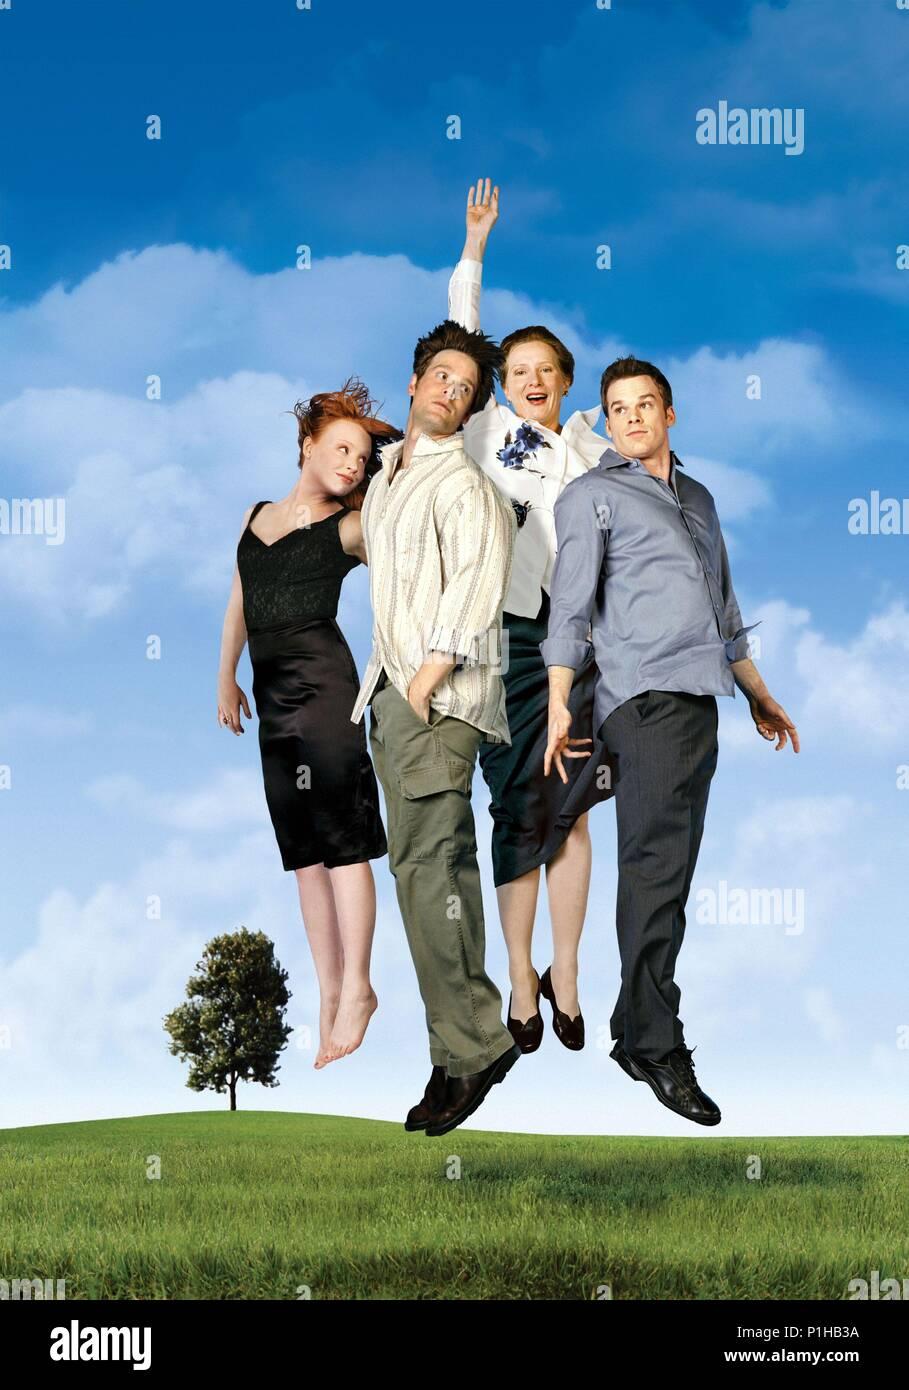 Original Filmle Six Feet Under Englishle Six Feet Under Year 2001 Credit Hbo Al